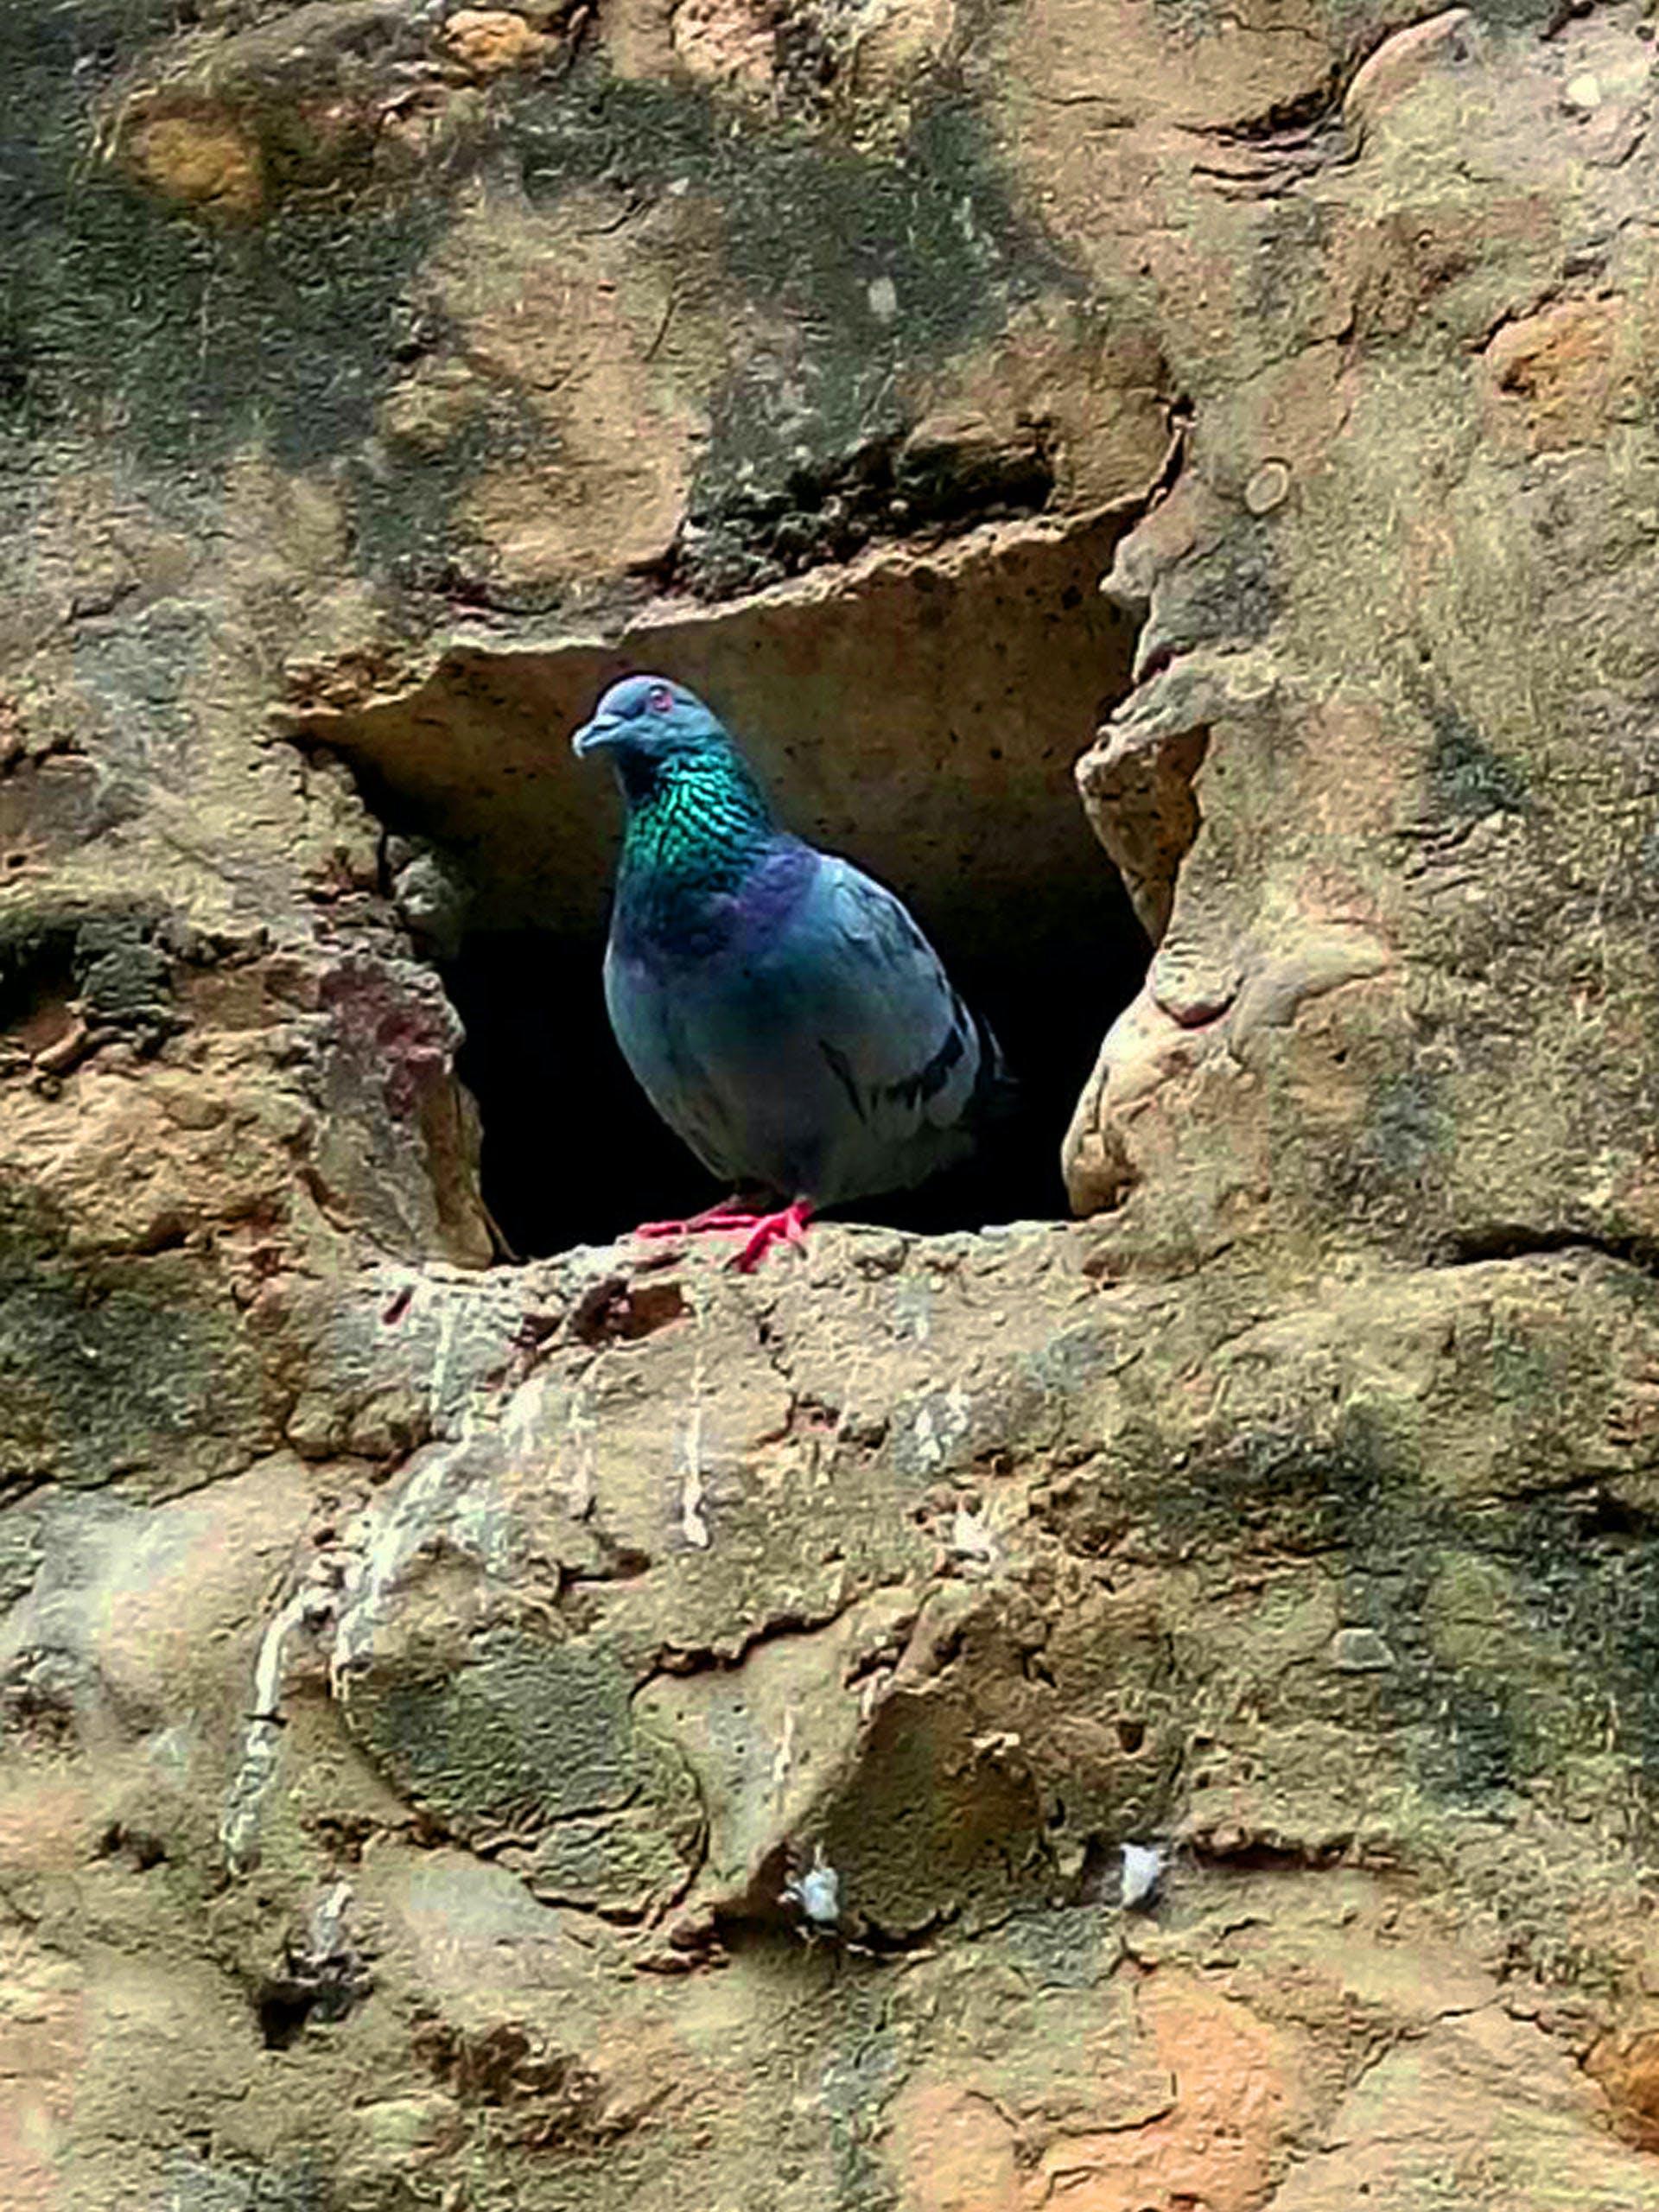 Free stock photo of #bird, bird house, peacock, peacock feathers